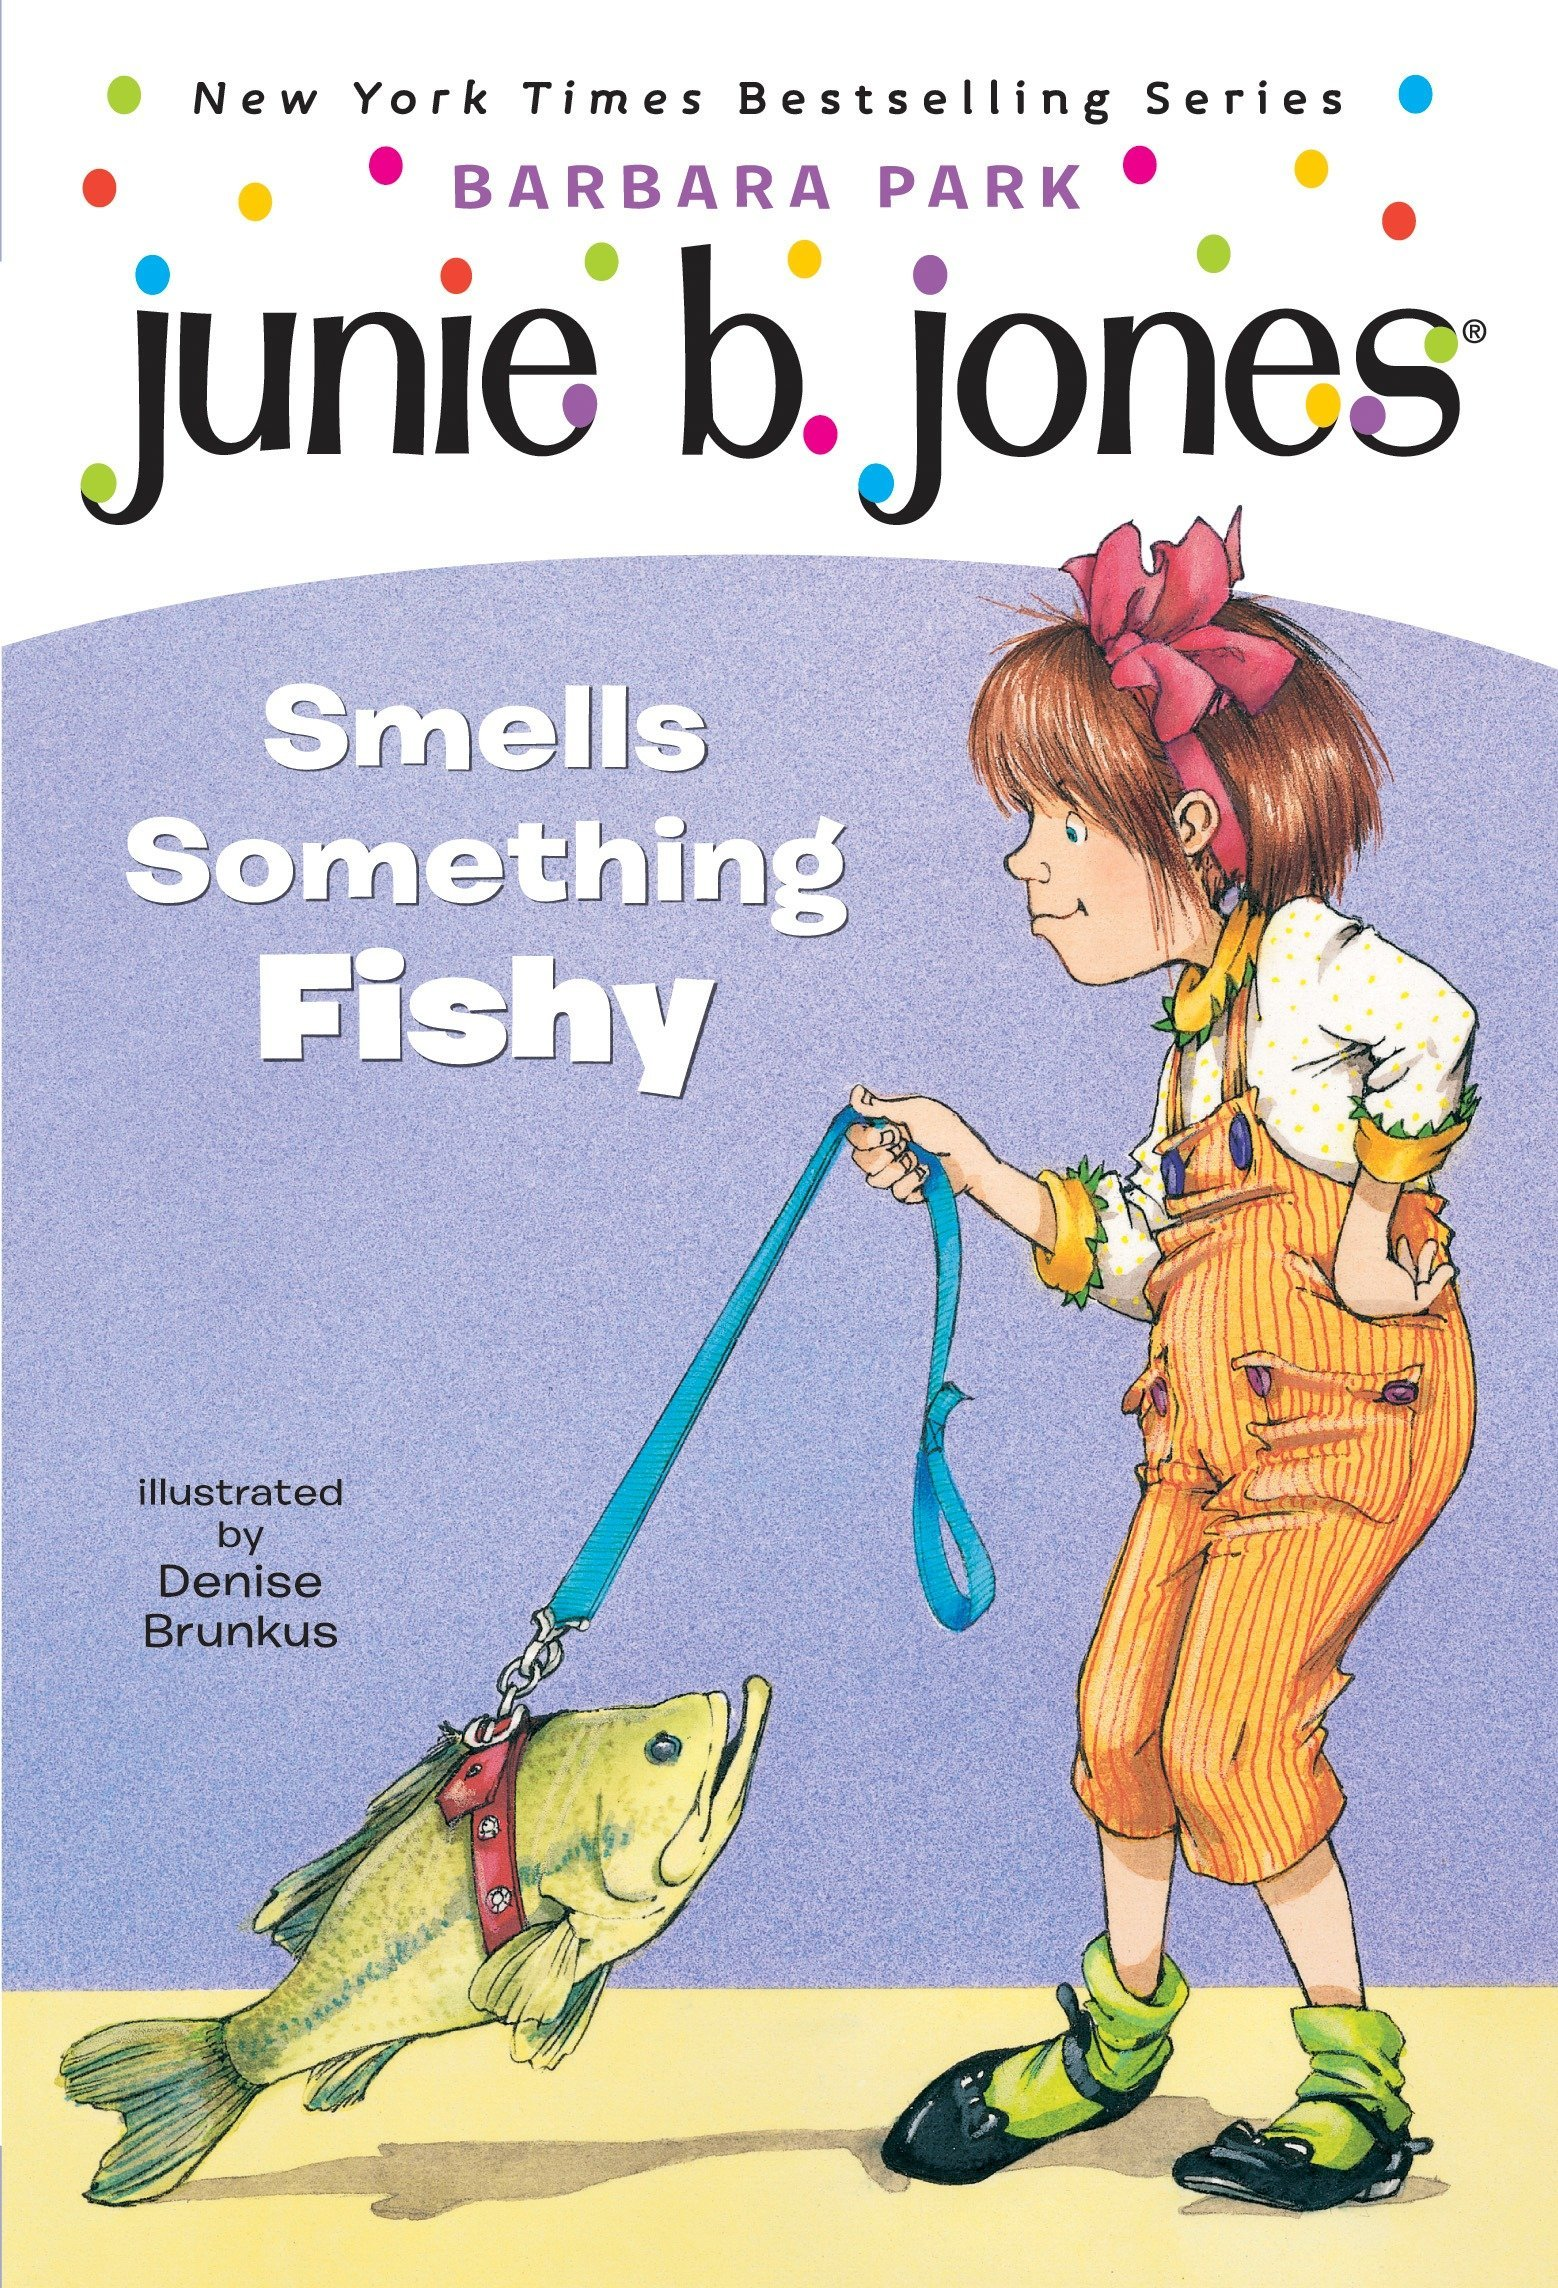 Amazon.com: Junie B. Jones Smells Something Fishy (Junie B. Jones, No. 12)  (2015679891307): Barbara Park, Denise Brunkus: Books